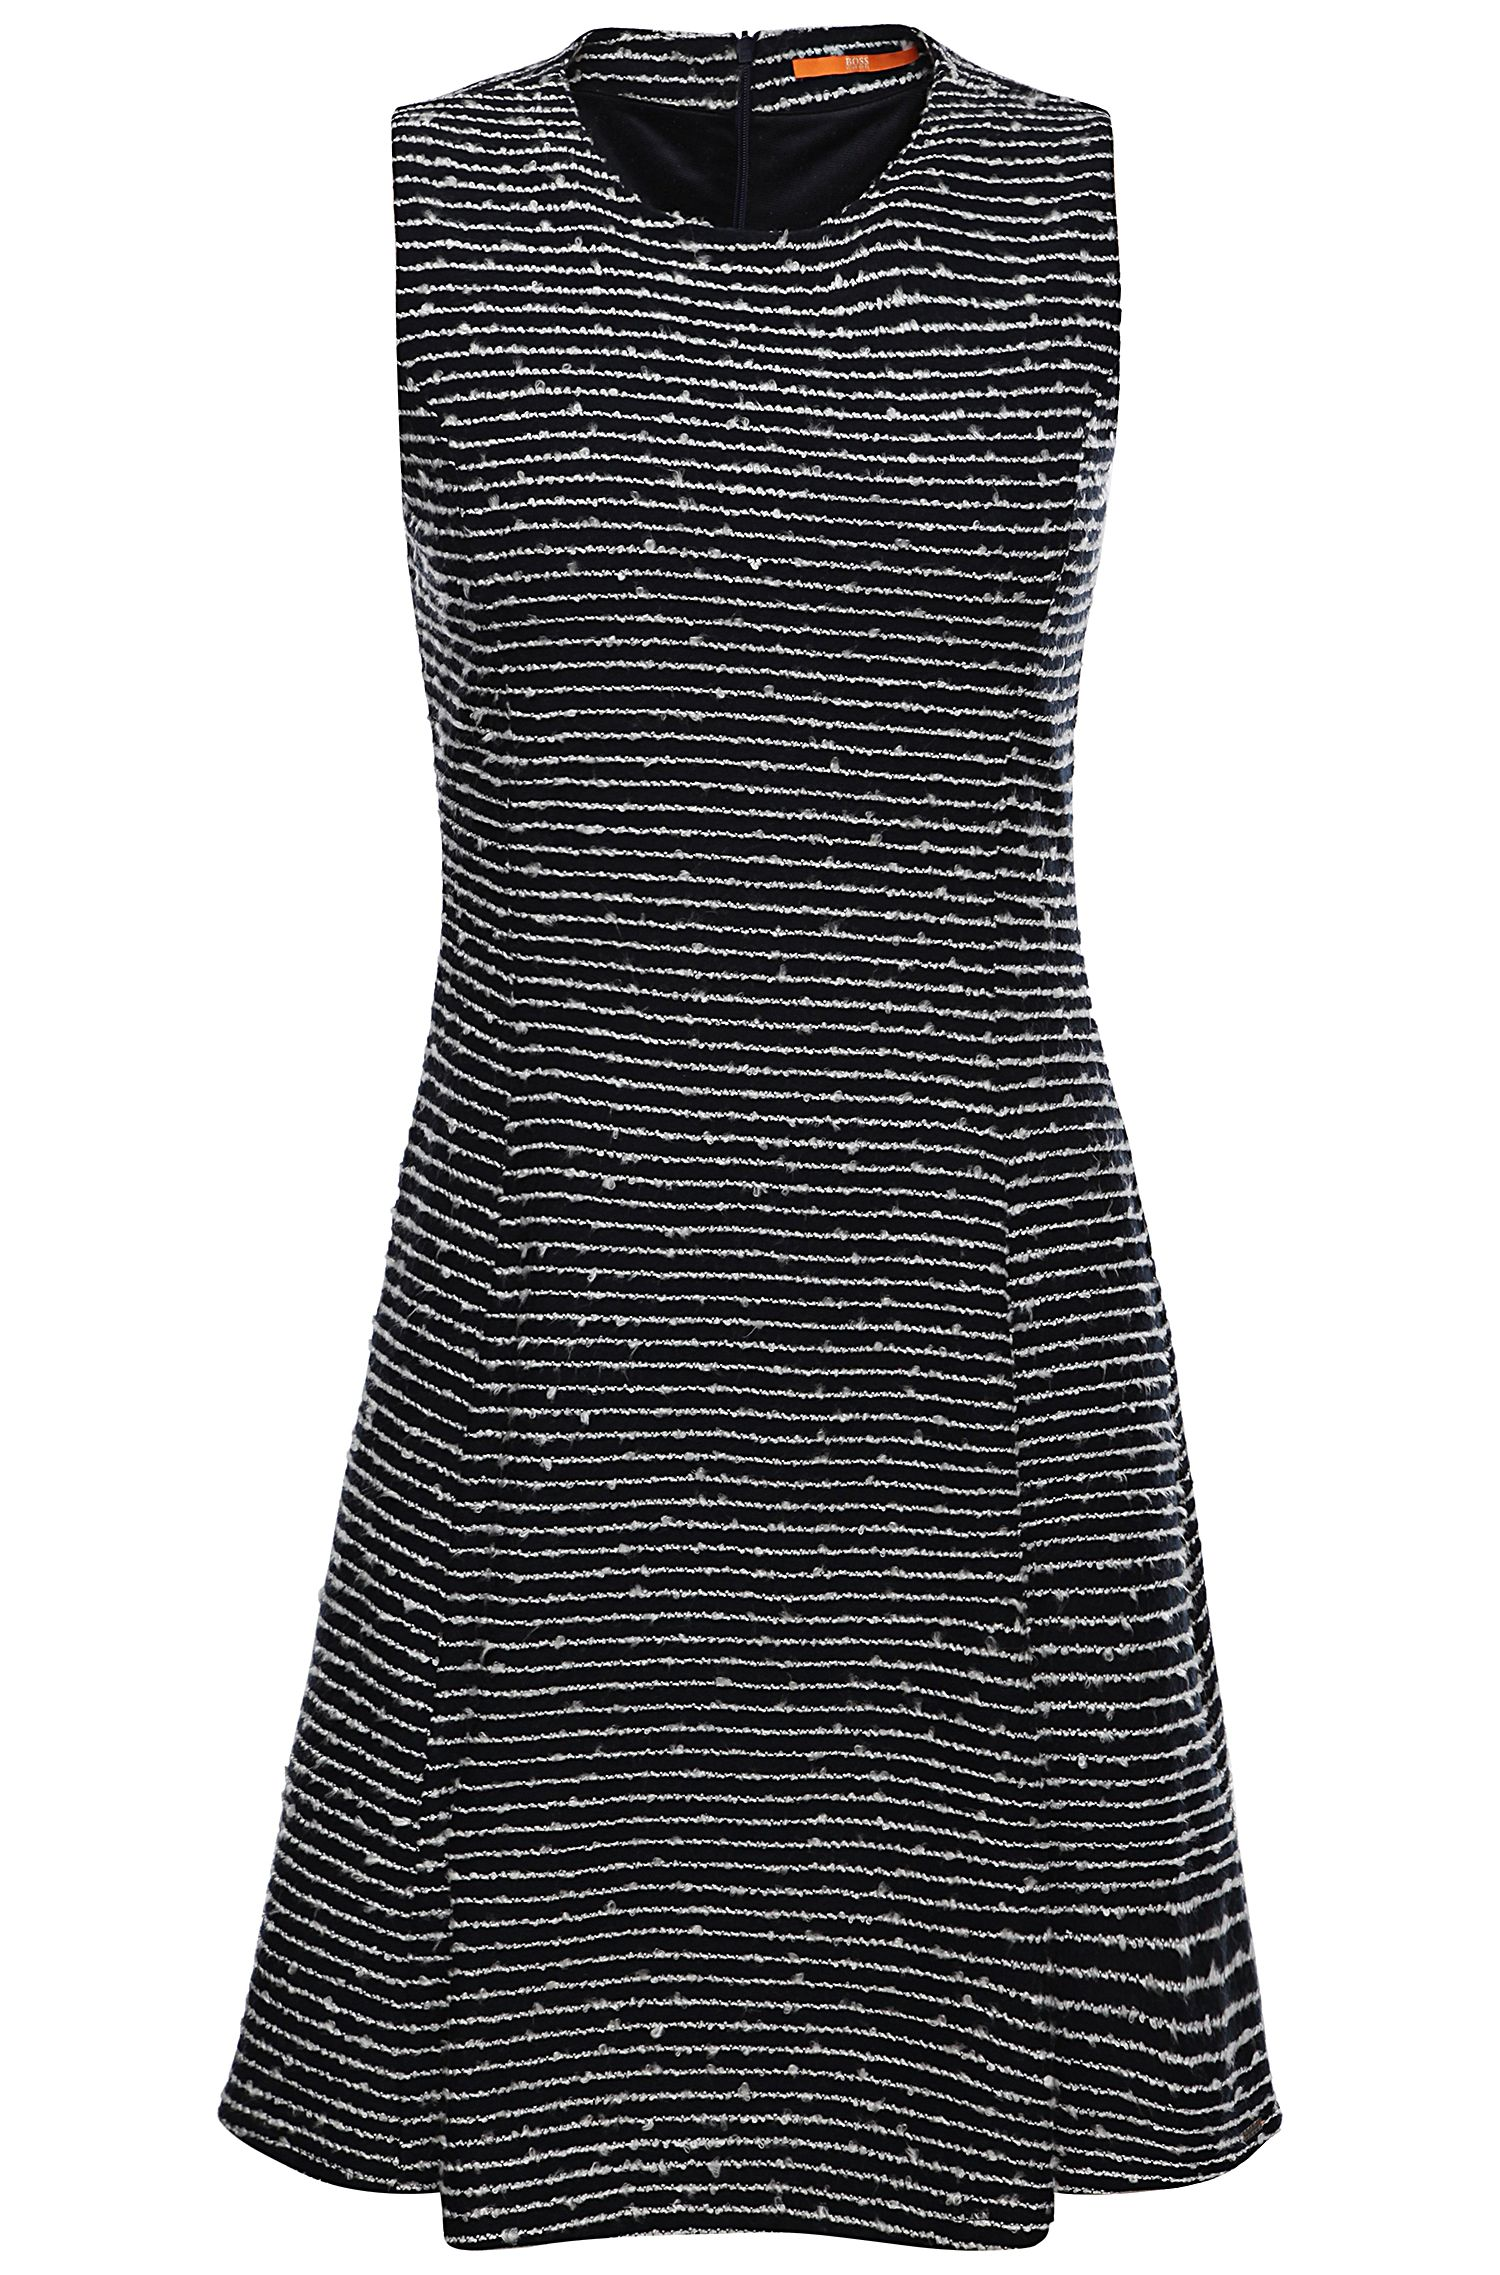 'Dicoco' | Stretch Cotton Embroidered A-Line Dress